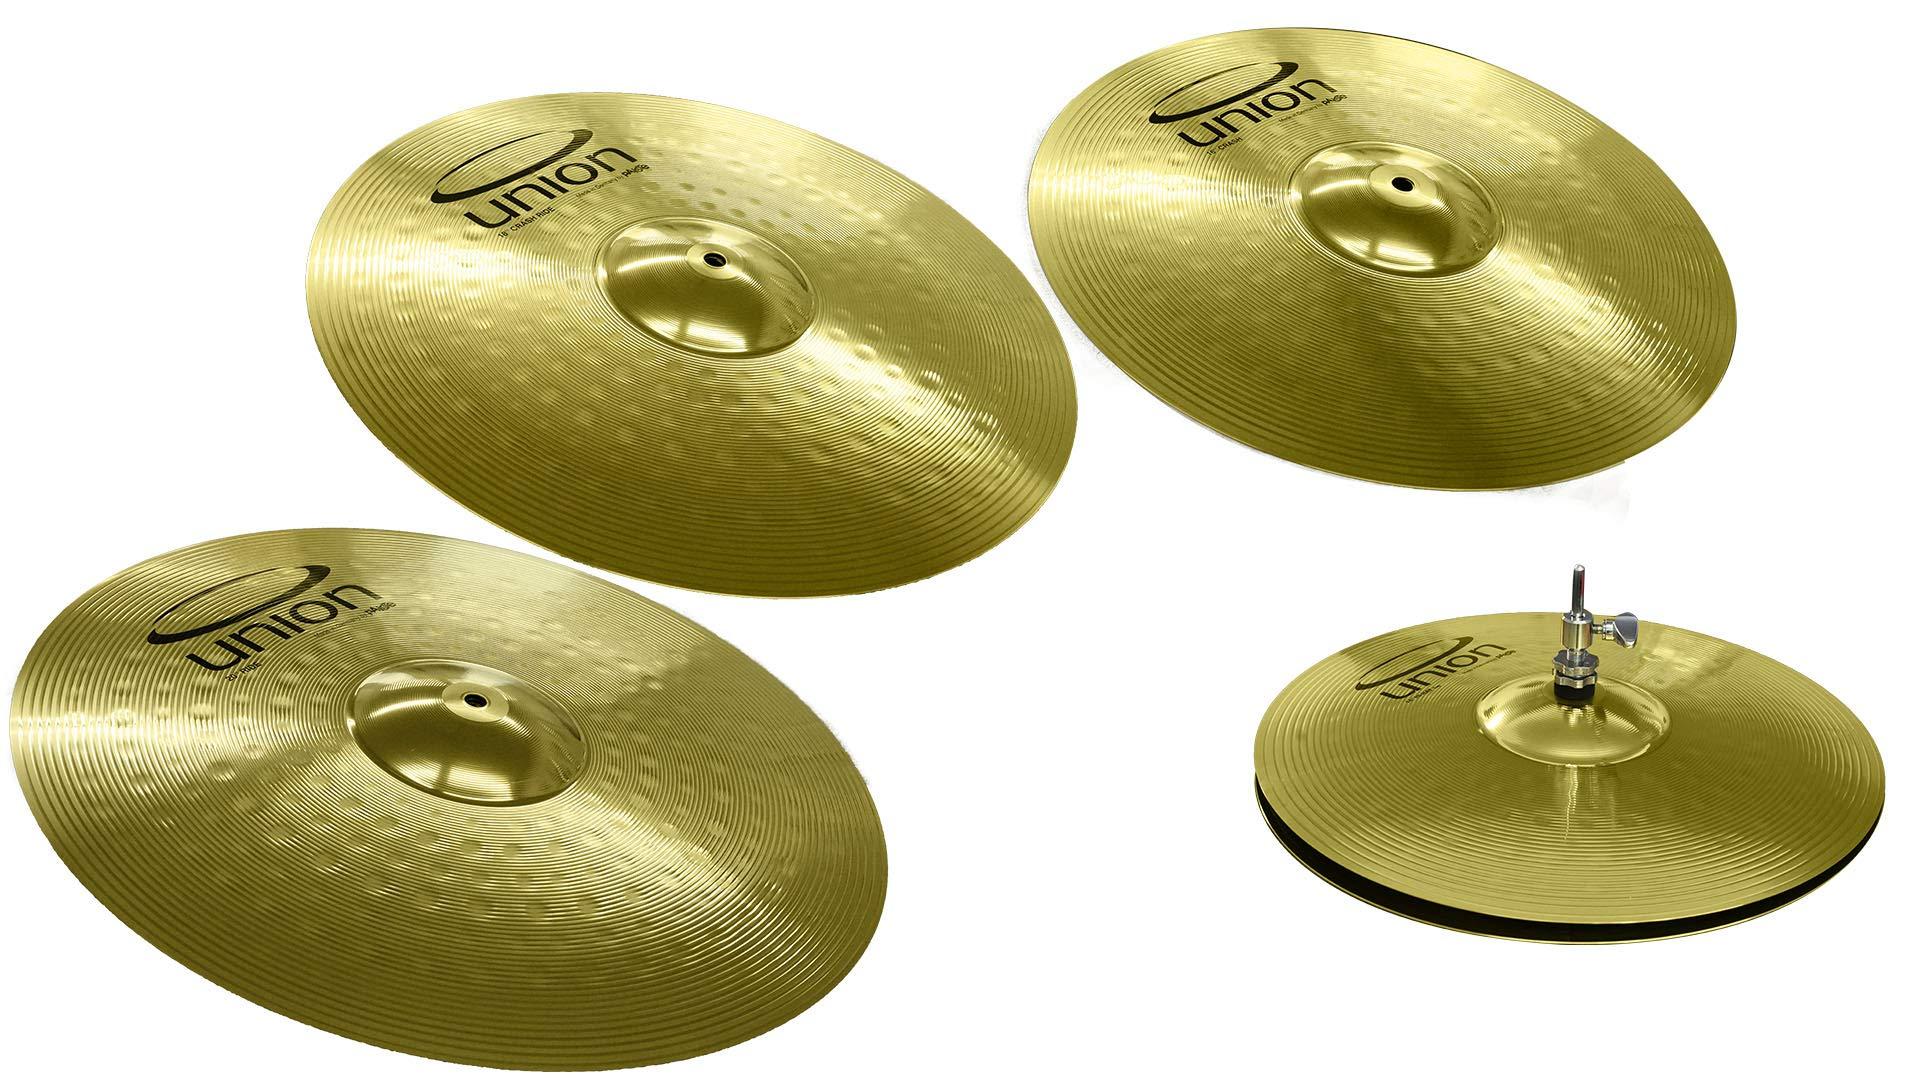 Union by Paiste 5-Piece Brass Cymbal Set 14 inch Hi-Hats/16 Crash/18 Crash-Ride/20 inch Ride (OEMBEXKP) by Union